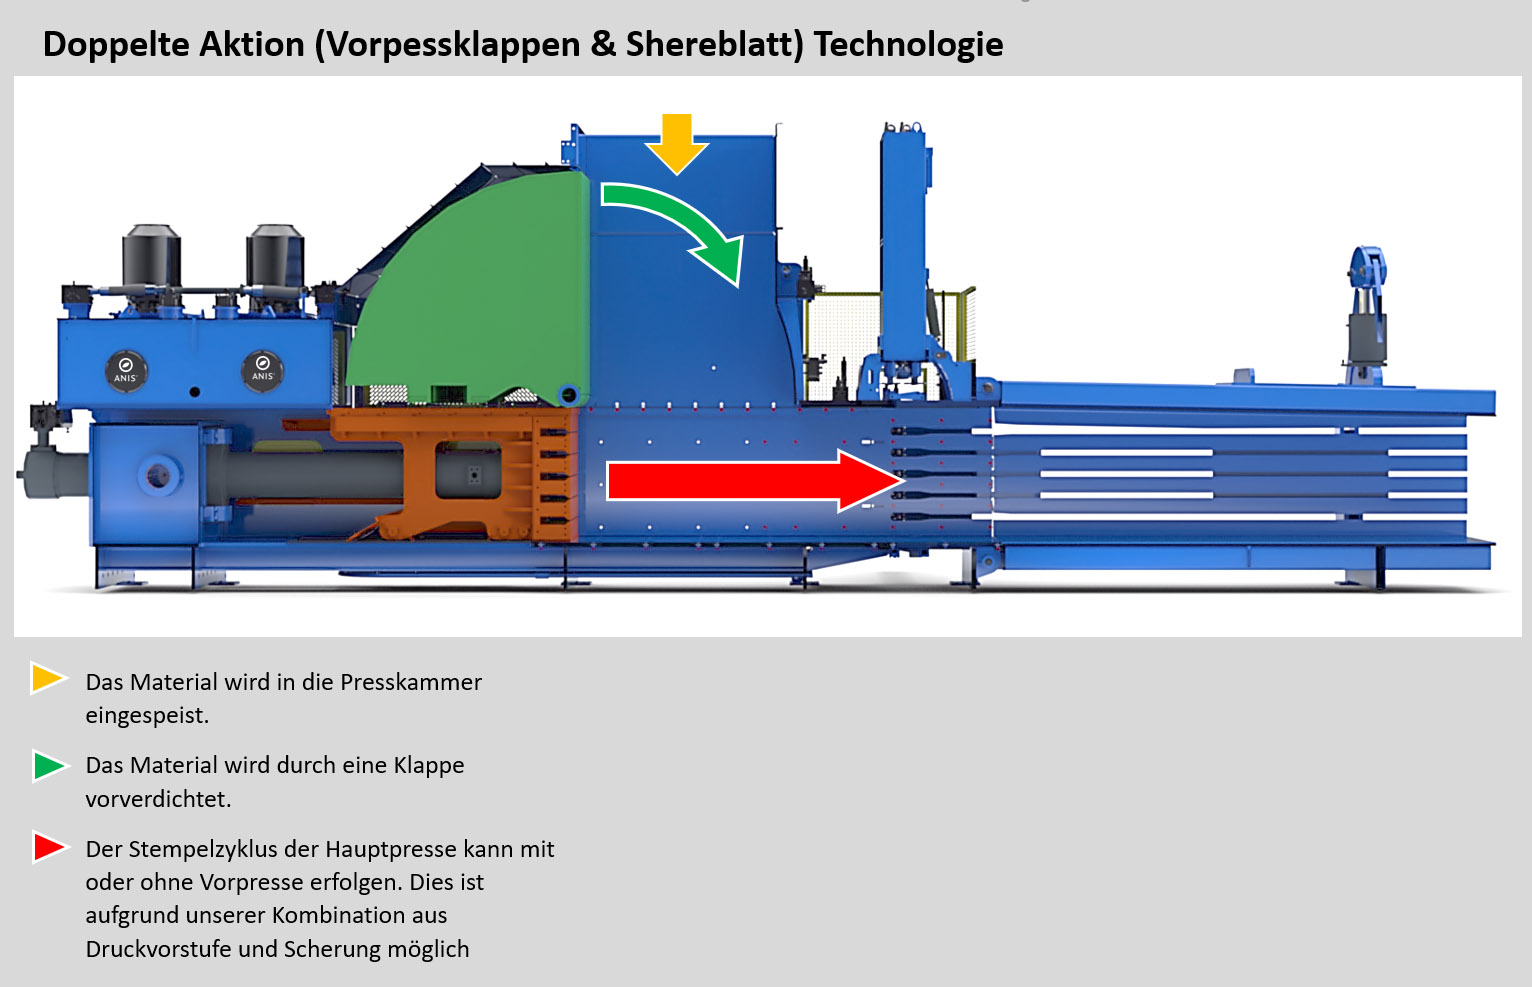 Doppelte Aktion (Vorpressklappen & Shereblatt) Technologie